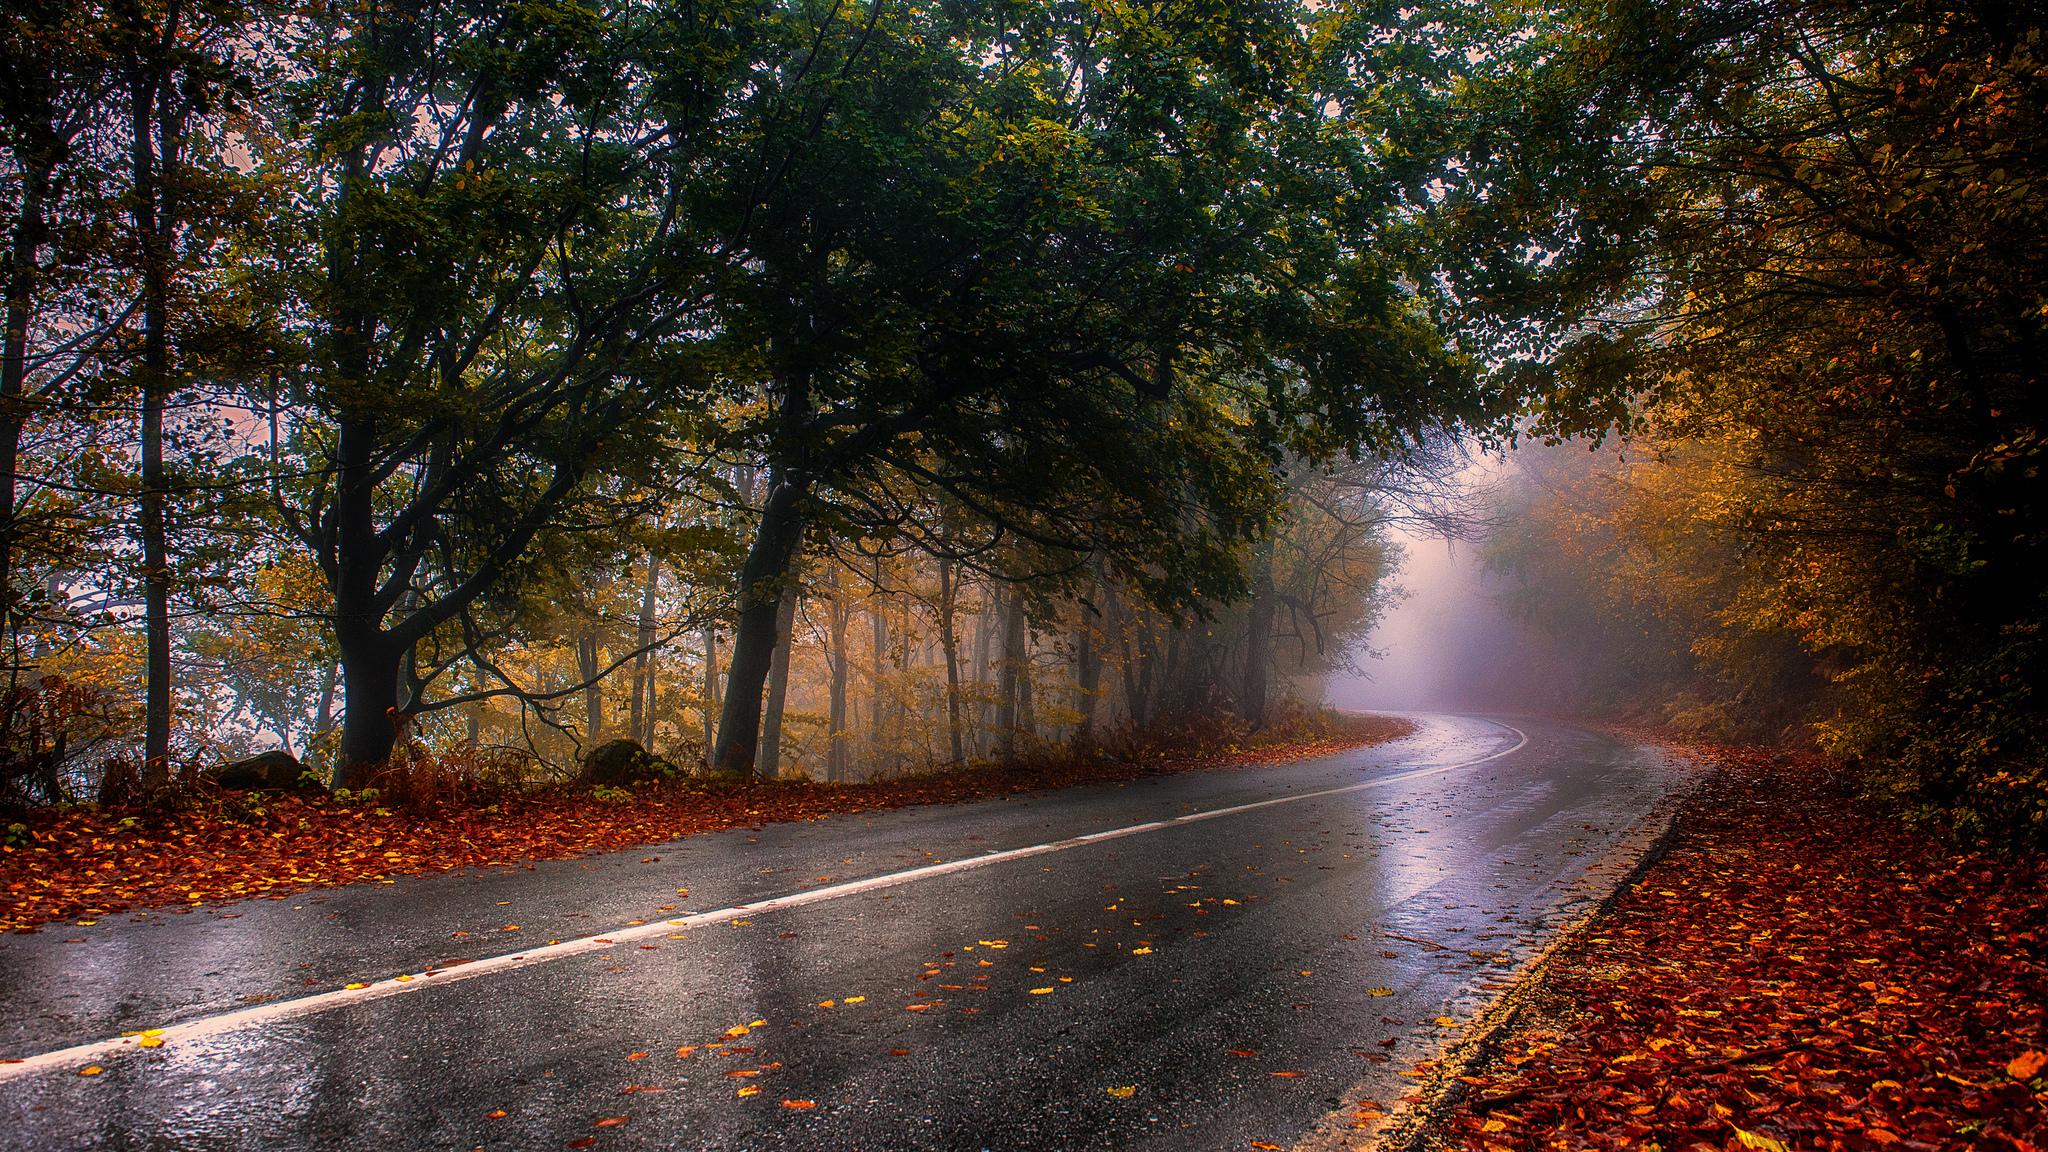 Autumn wet road / 2048 x 1152 / Nature / Photography | MIRIADNA.COM